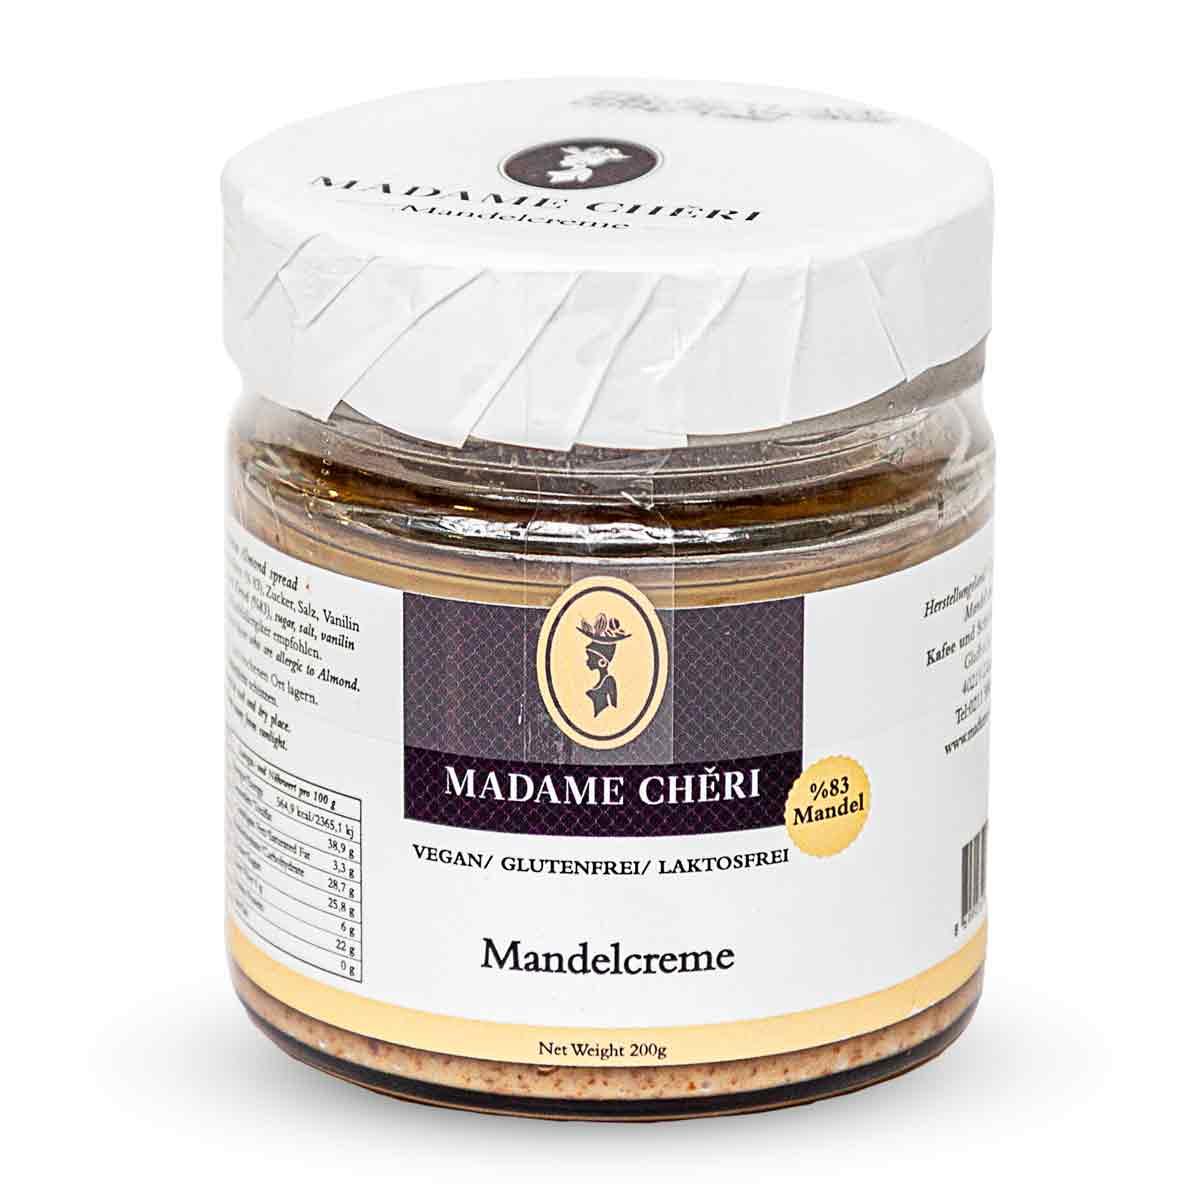 Madame Chêri - Mandelcreme (83%) - vegan